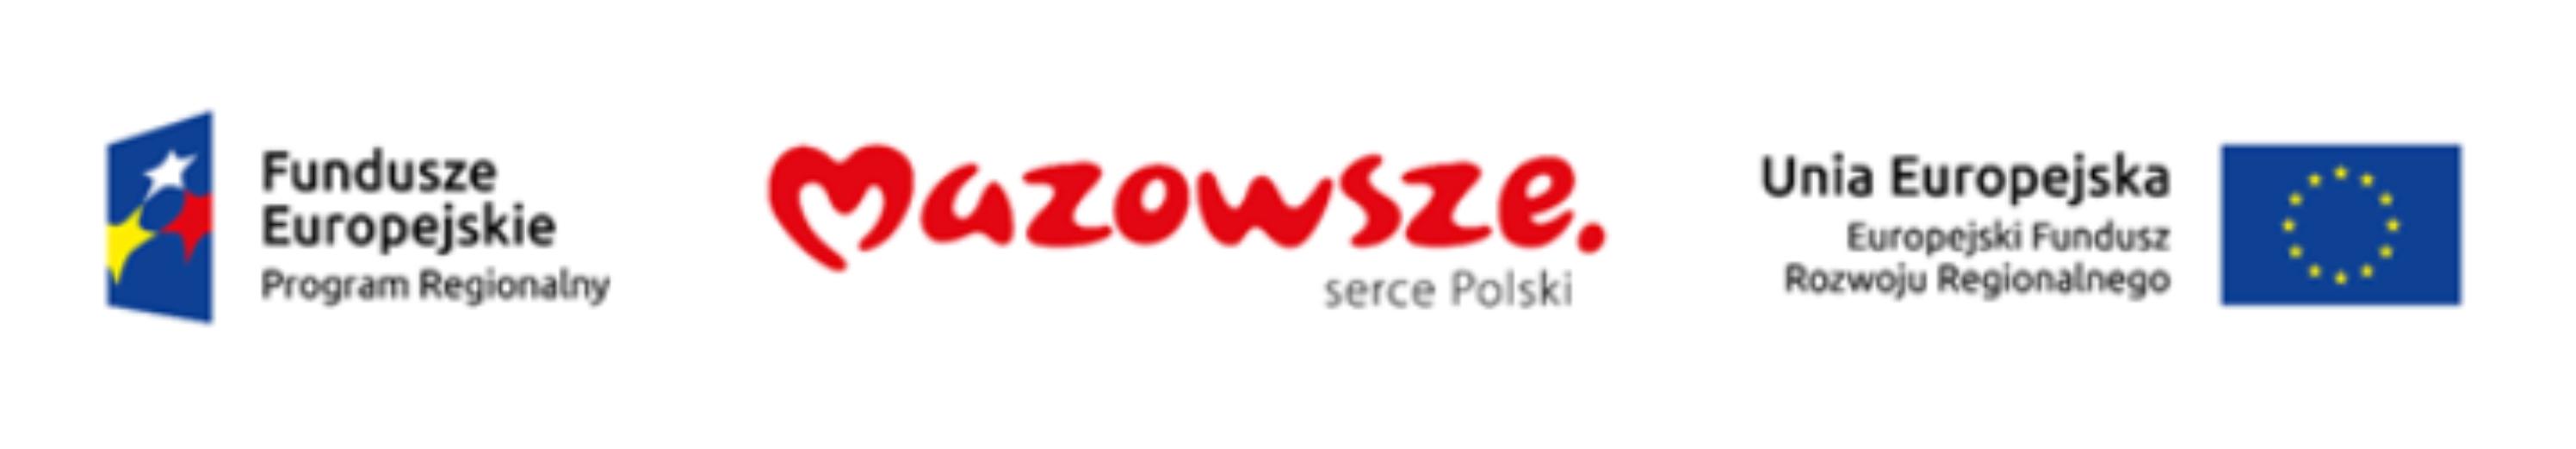 logo_projektjpg [2992x521]